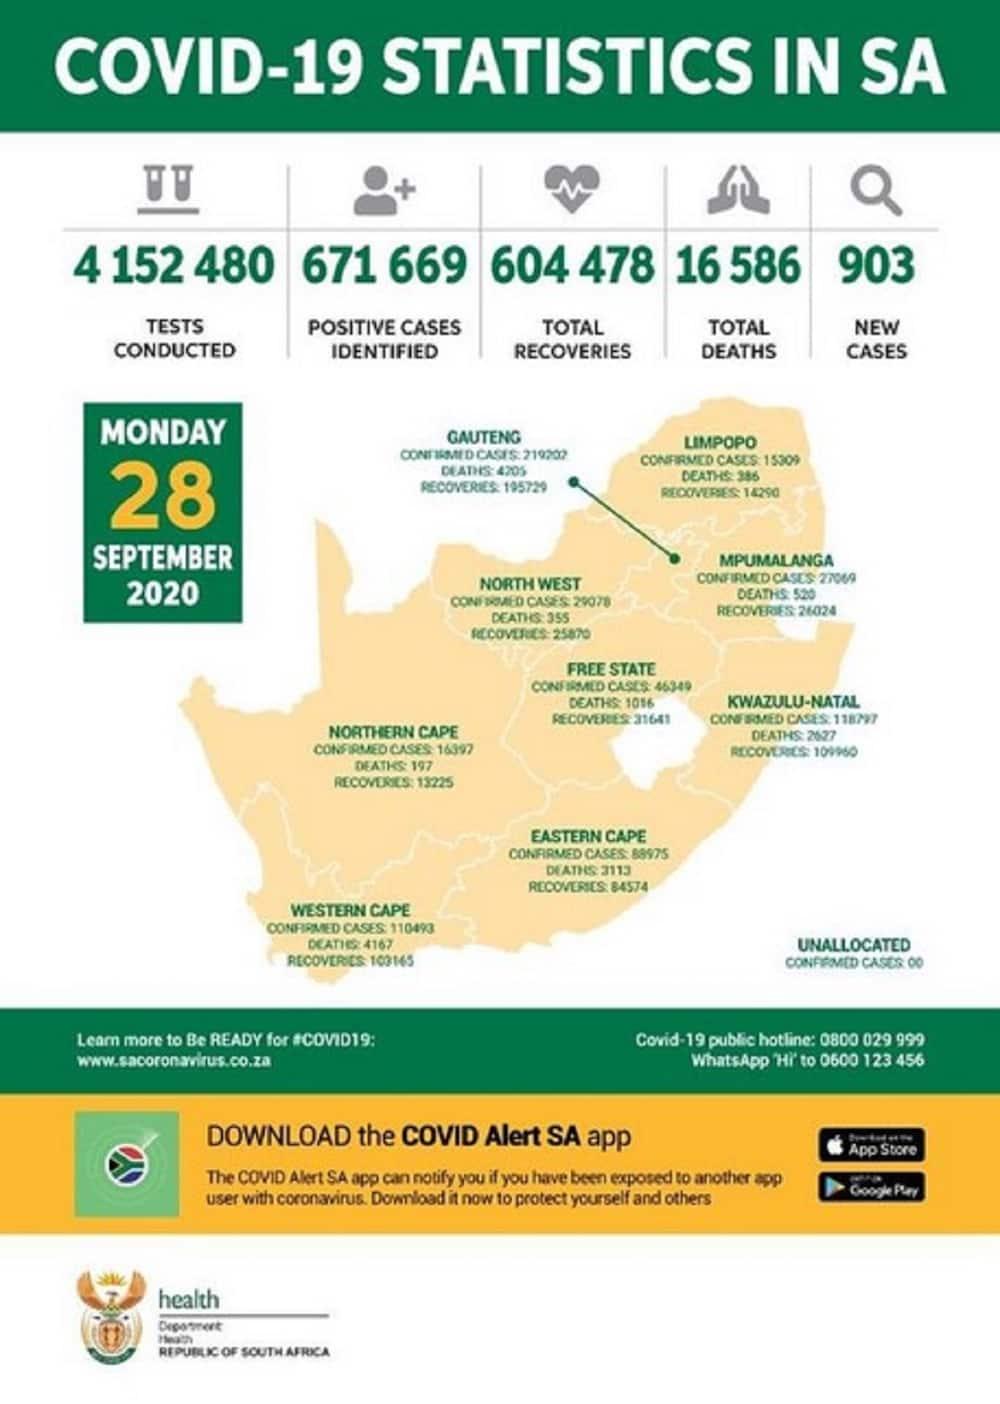 Covid update: SA records 188 new coronavirus deaths after data delay